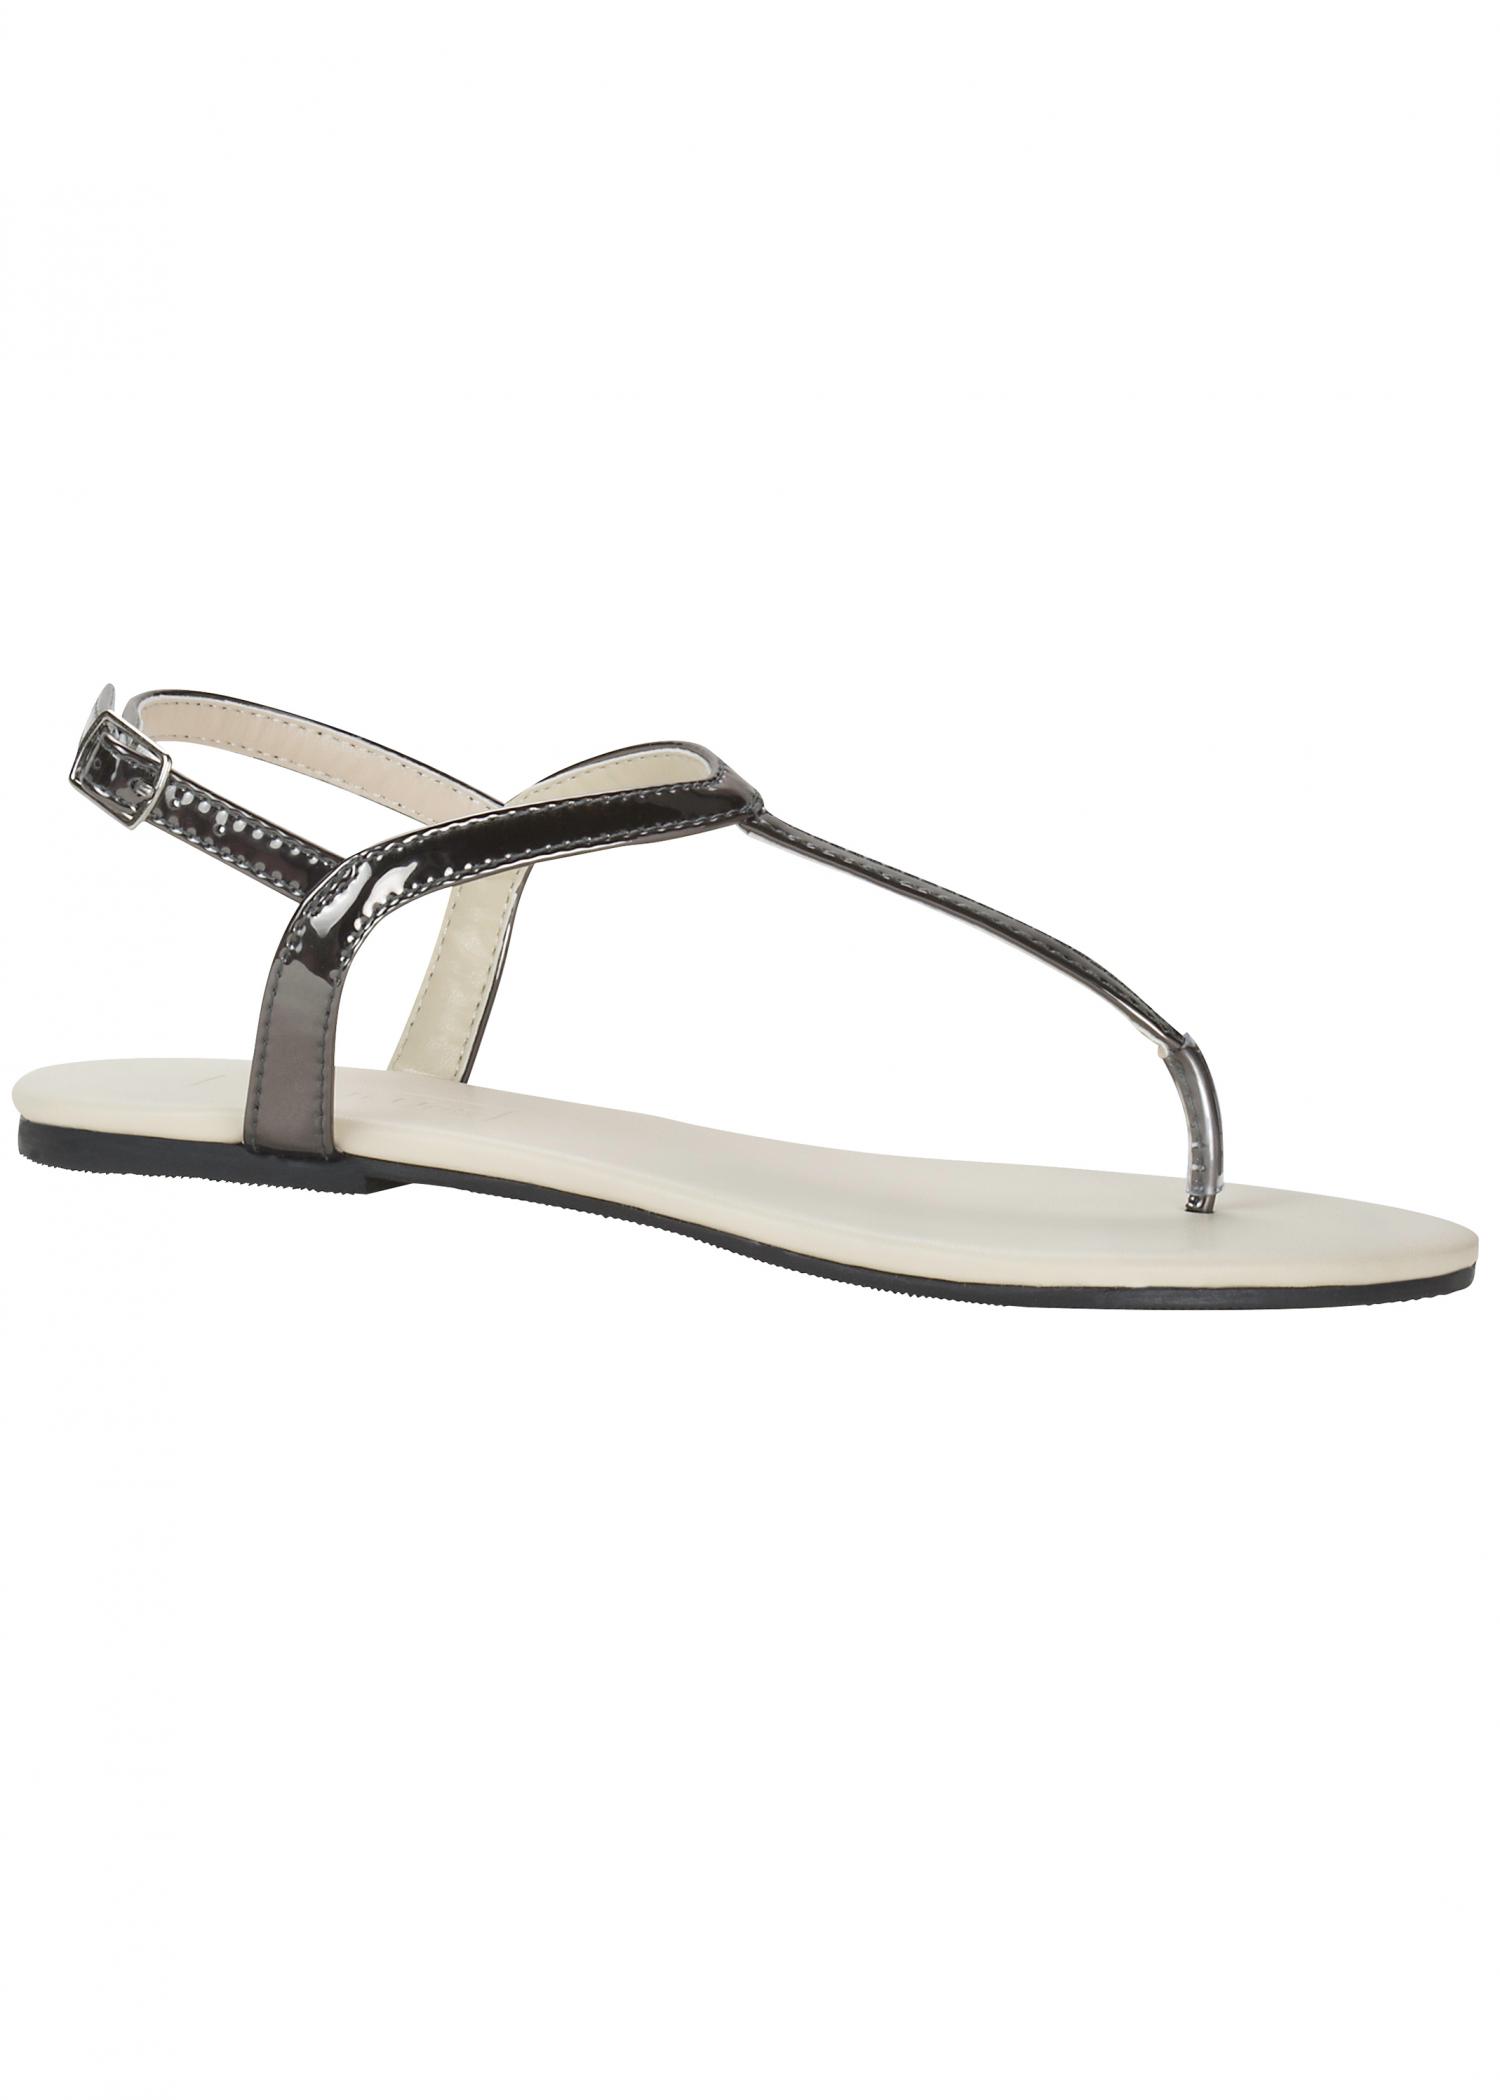 Touch Ups Steele Flat Thong Sandal